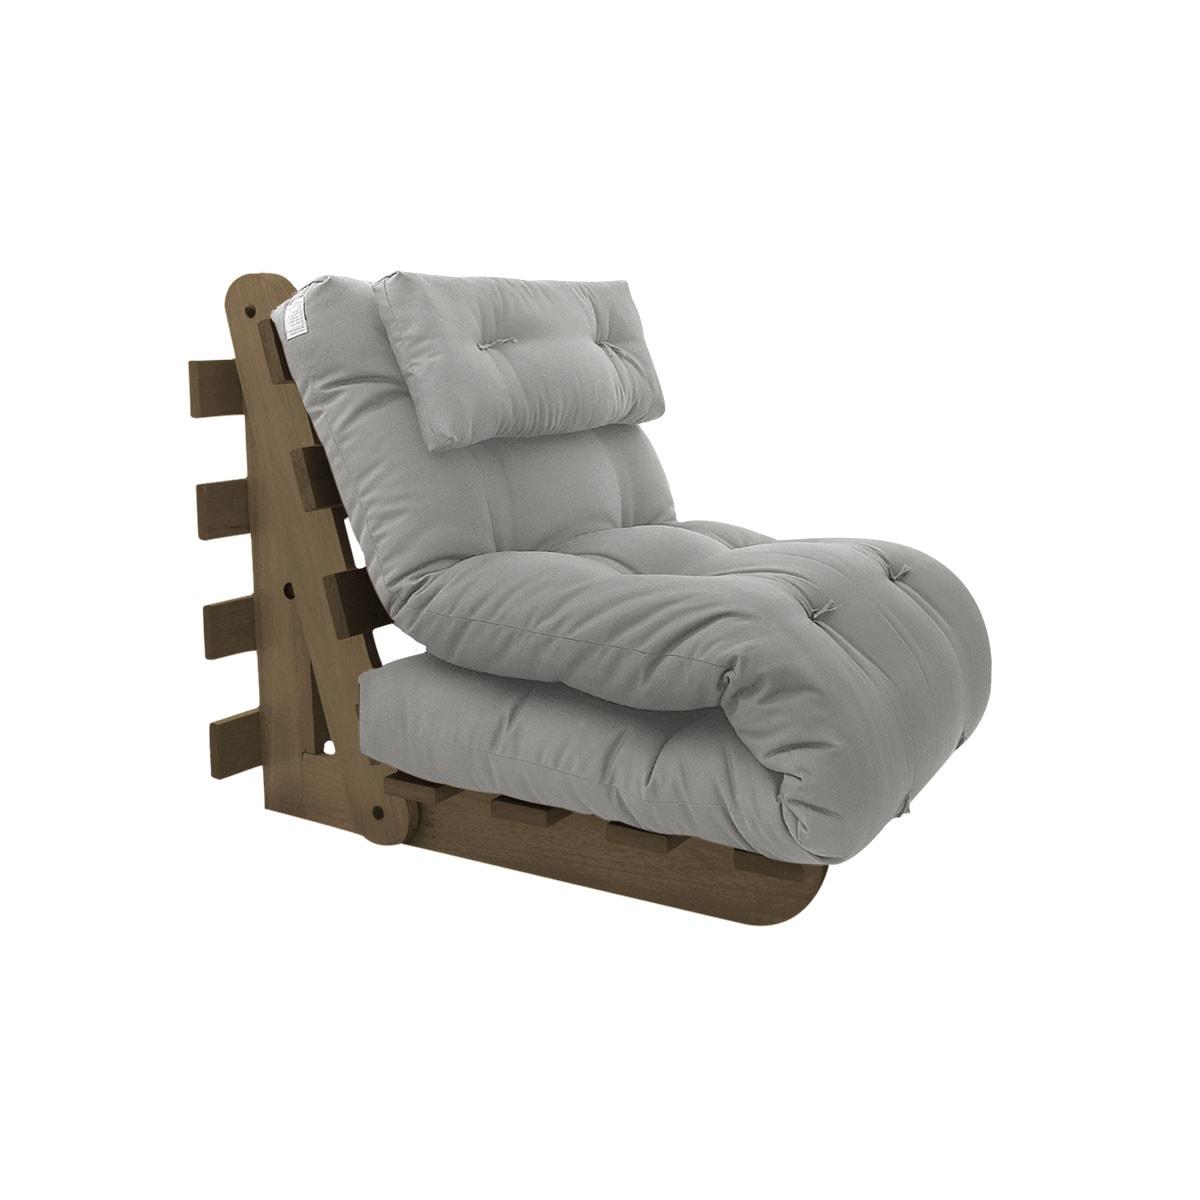 Sofa para varanda futon company - Sofas cama futon ...